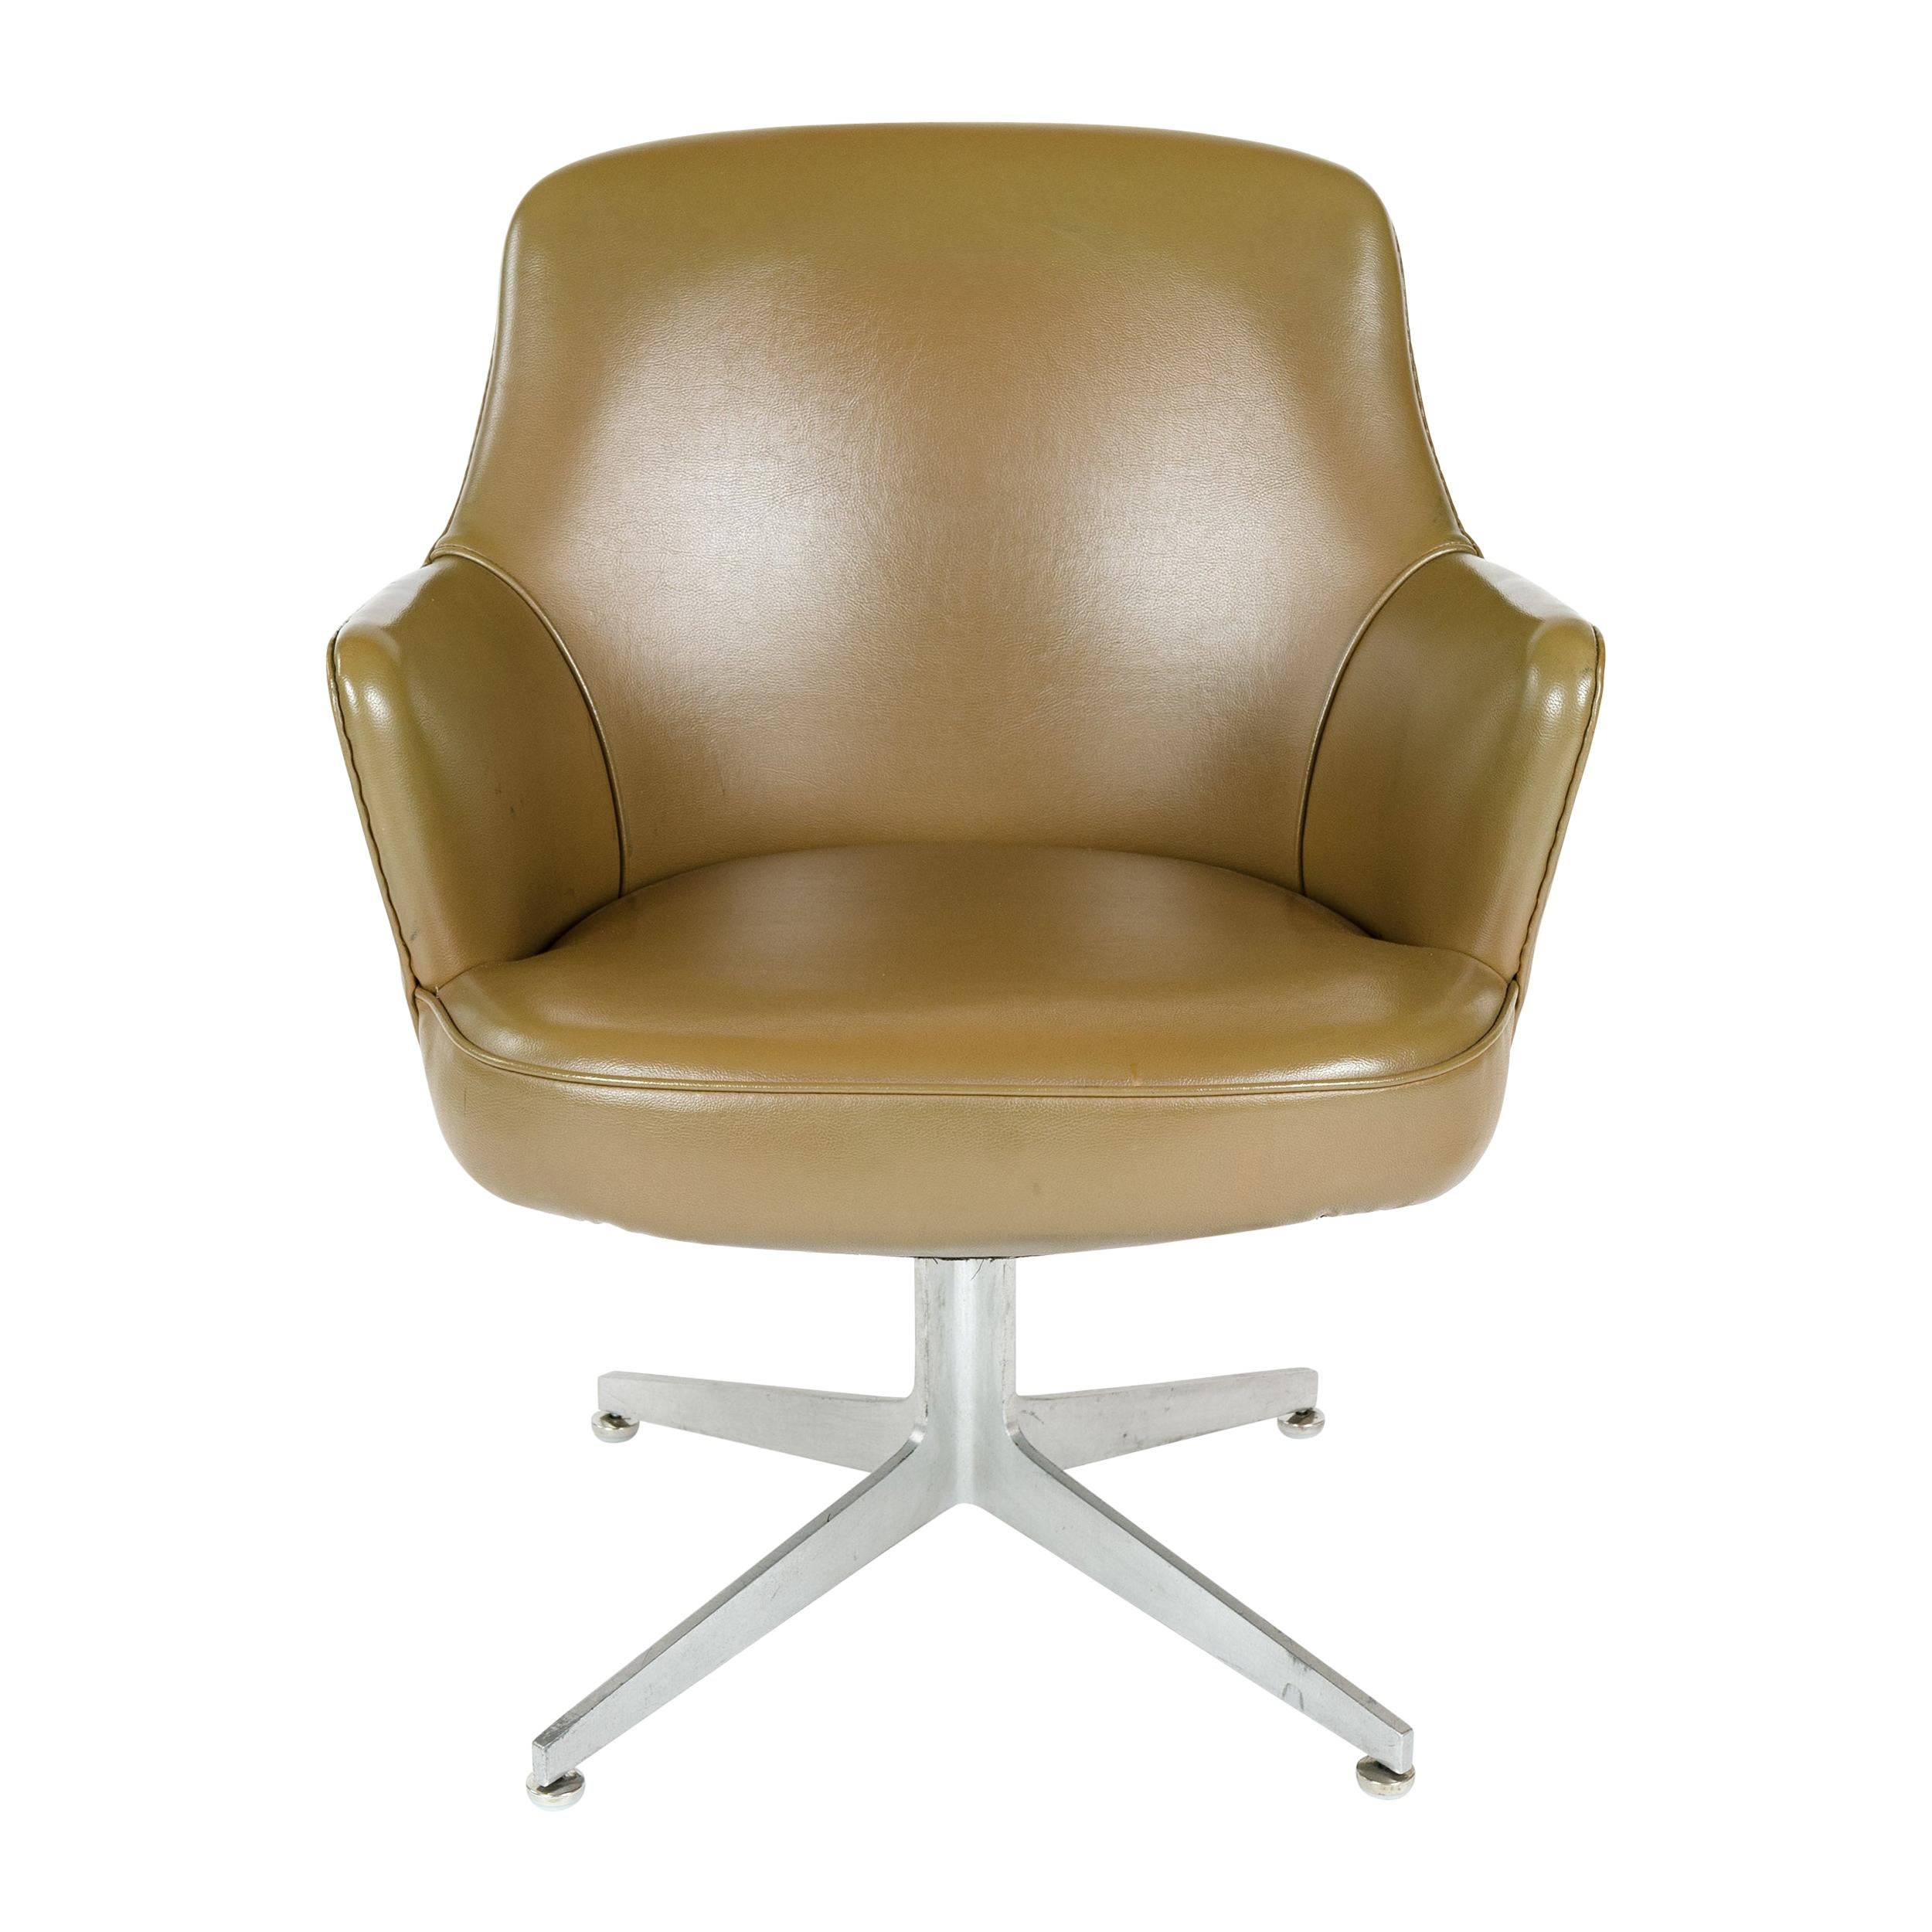 1960s Desk Chair by Ward Bennett